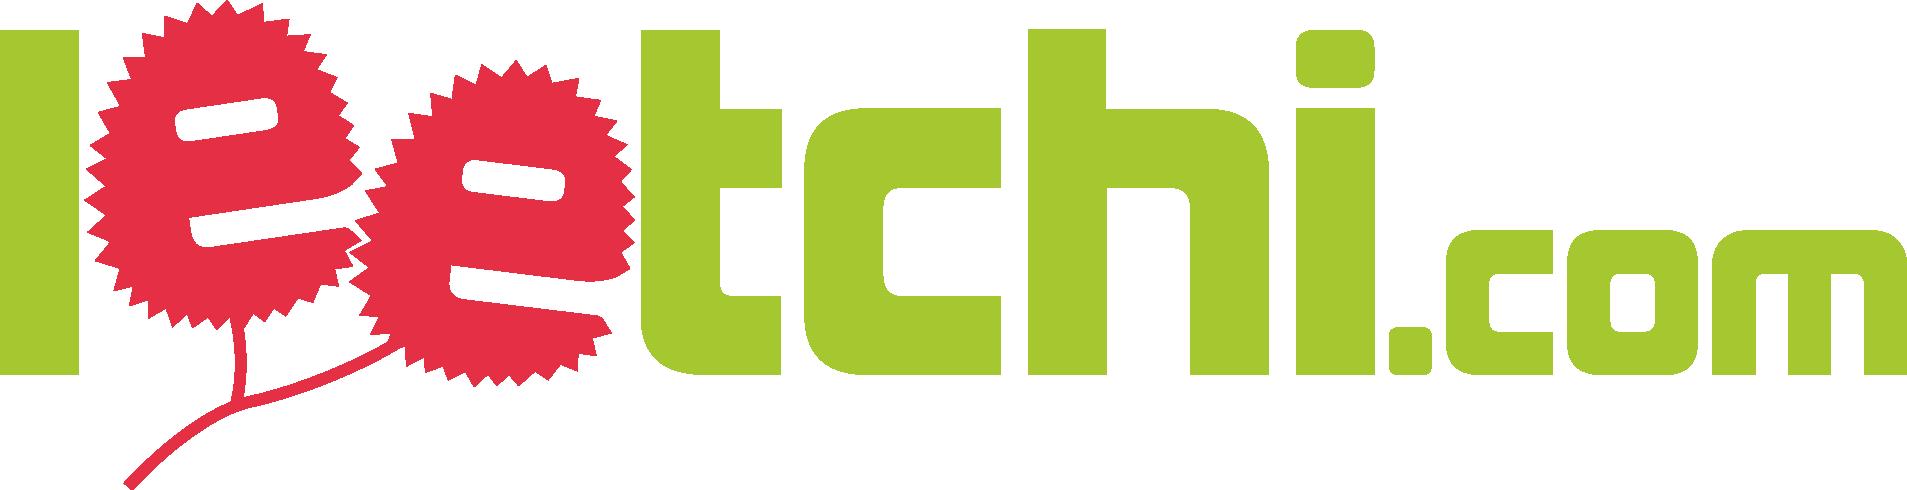 Leetchi Leetchi UK